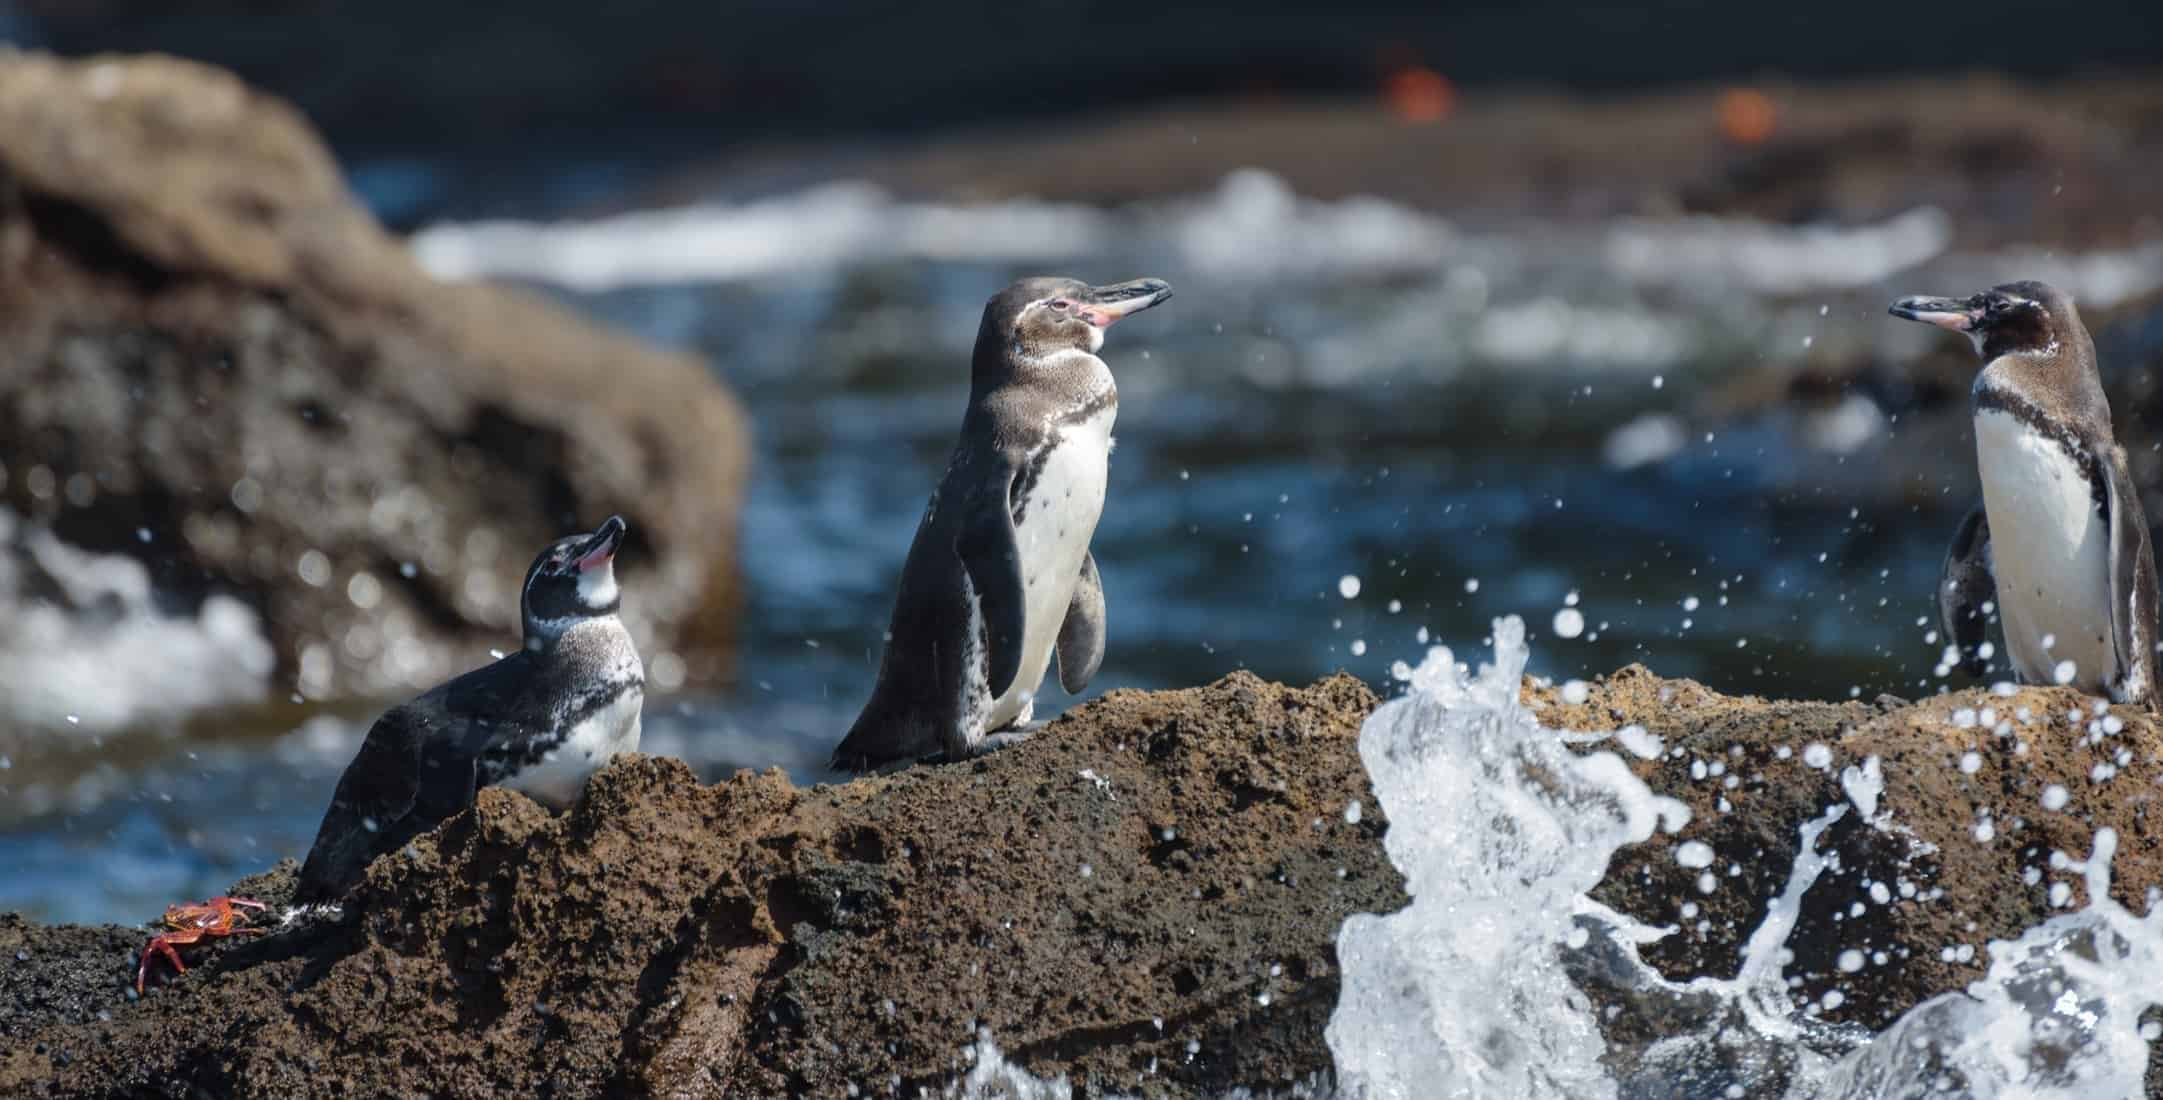 Group of Galapagos penguins on a rock in Santiago Island, Galapagos Island, Ecuador, South America.